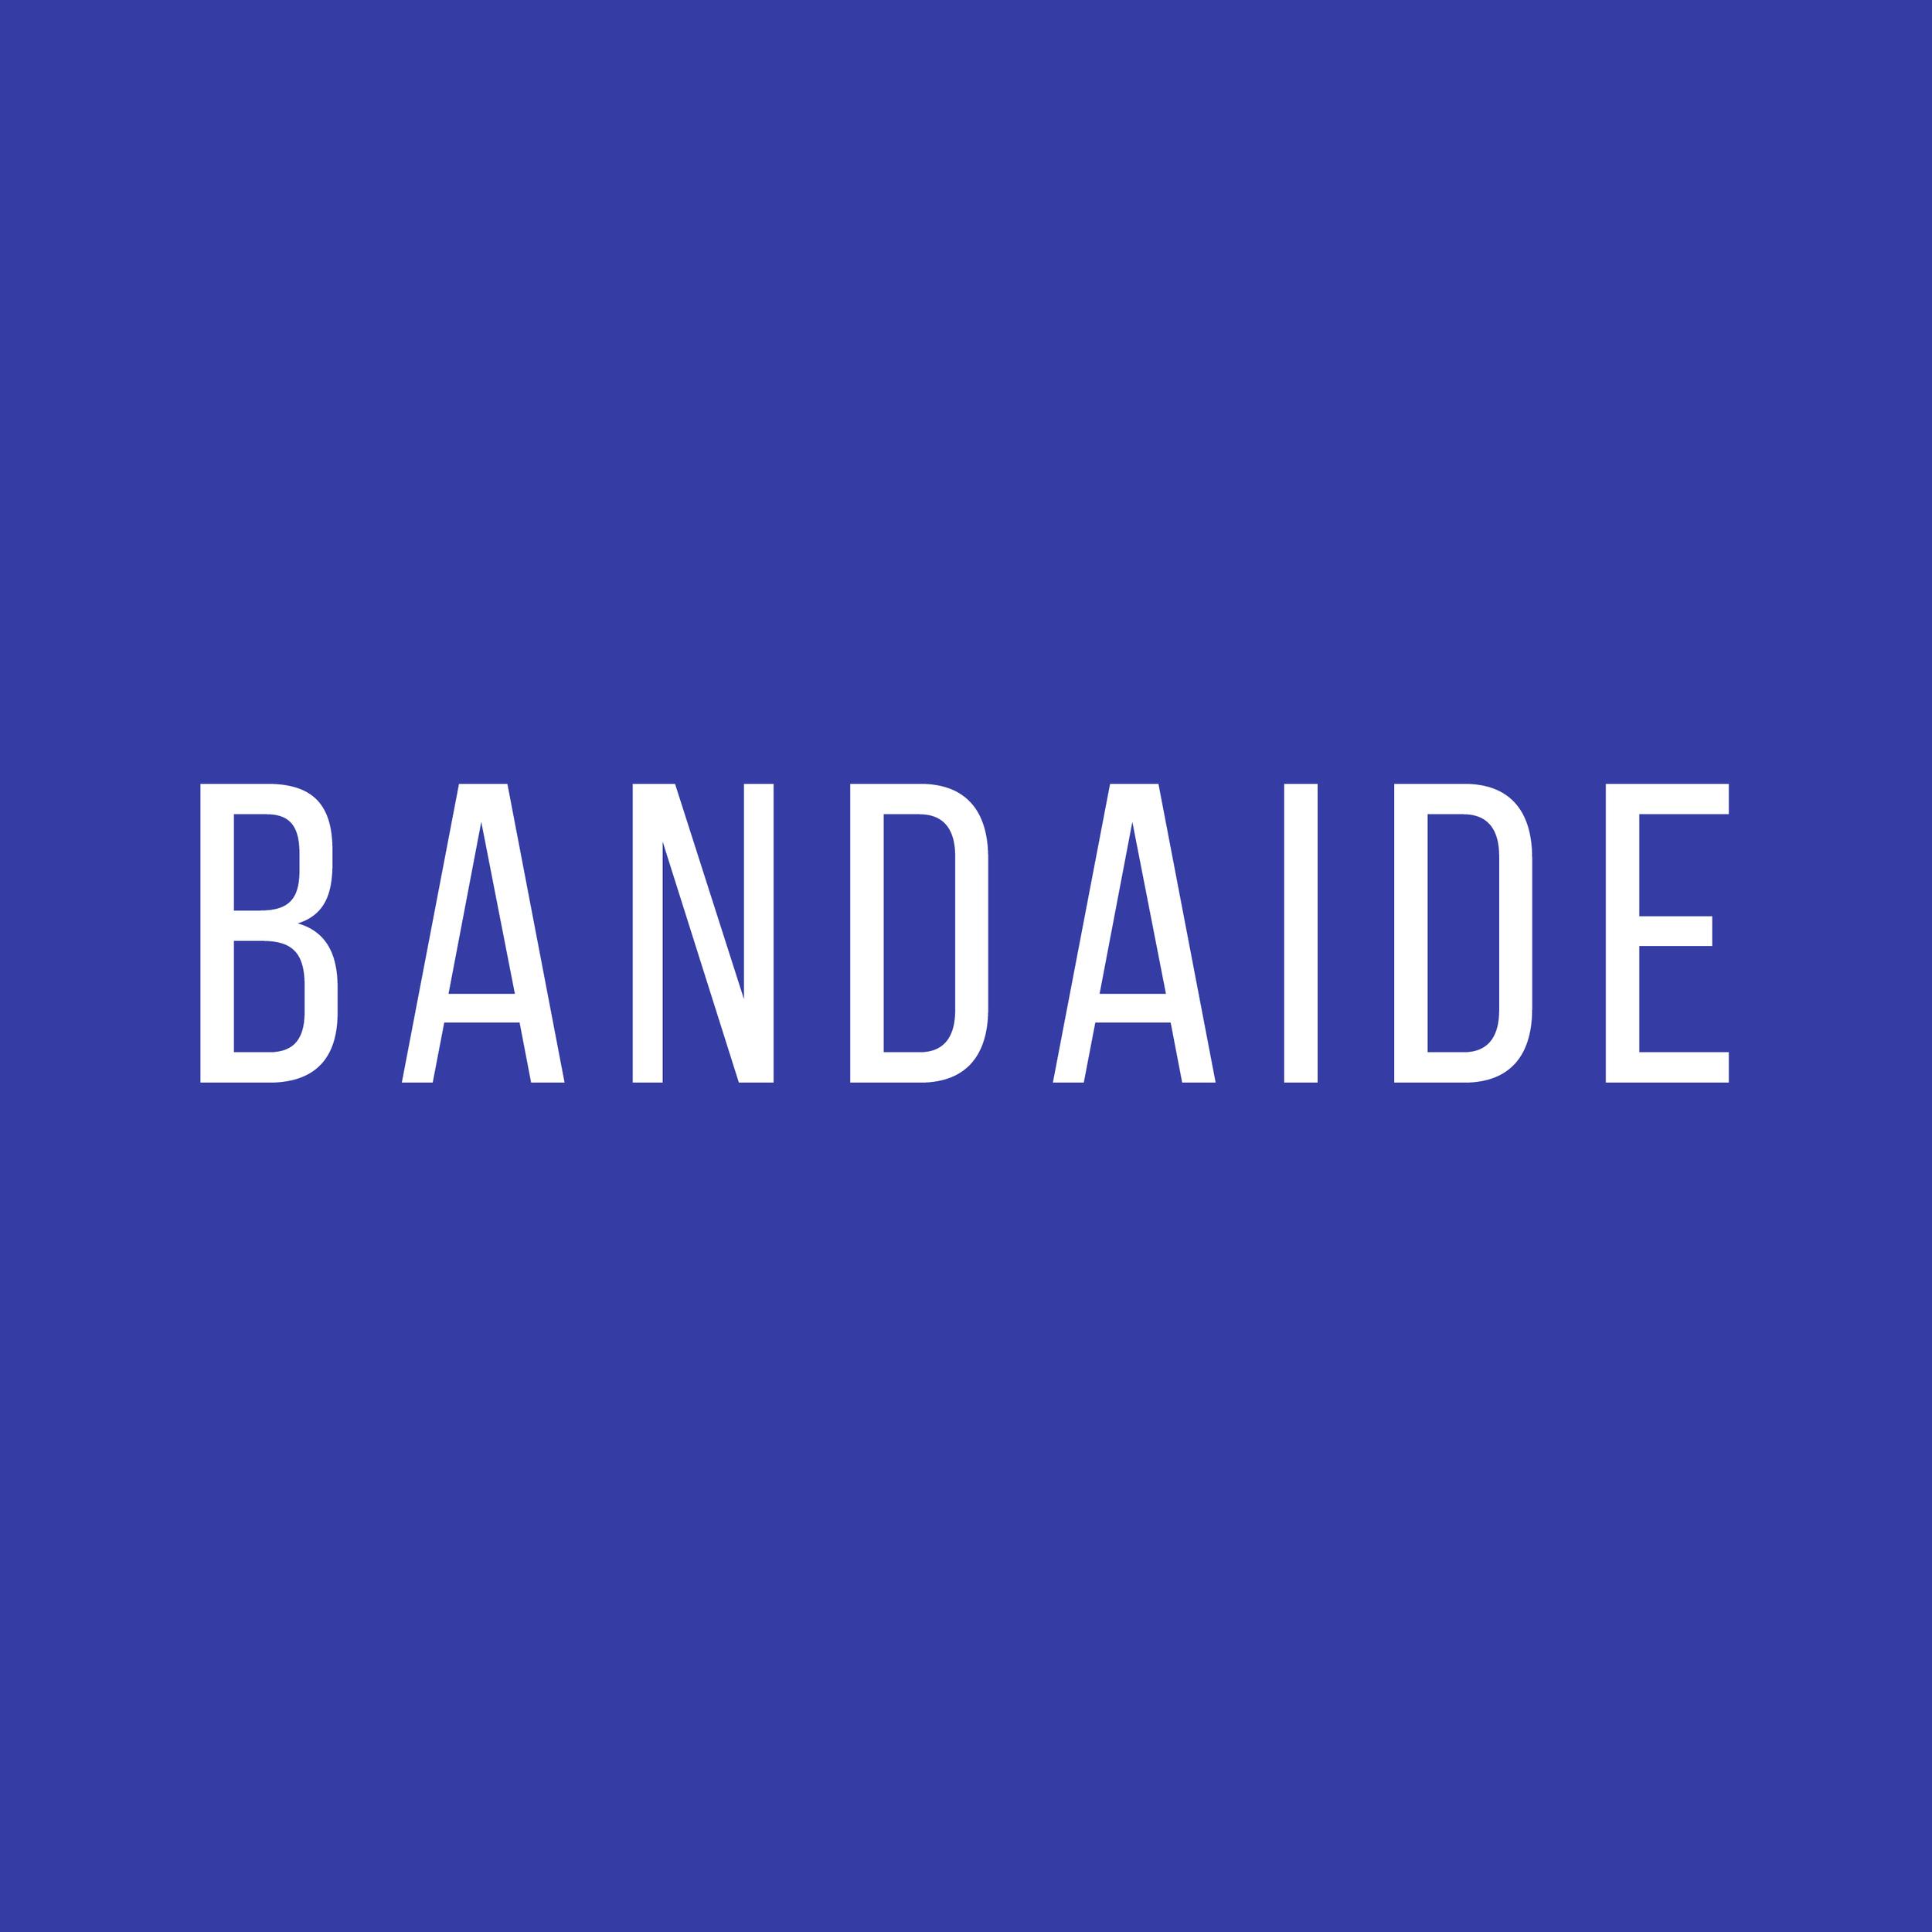 bandaide logosqblue.jpg